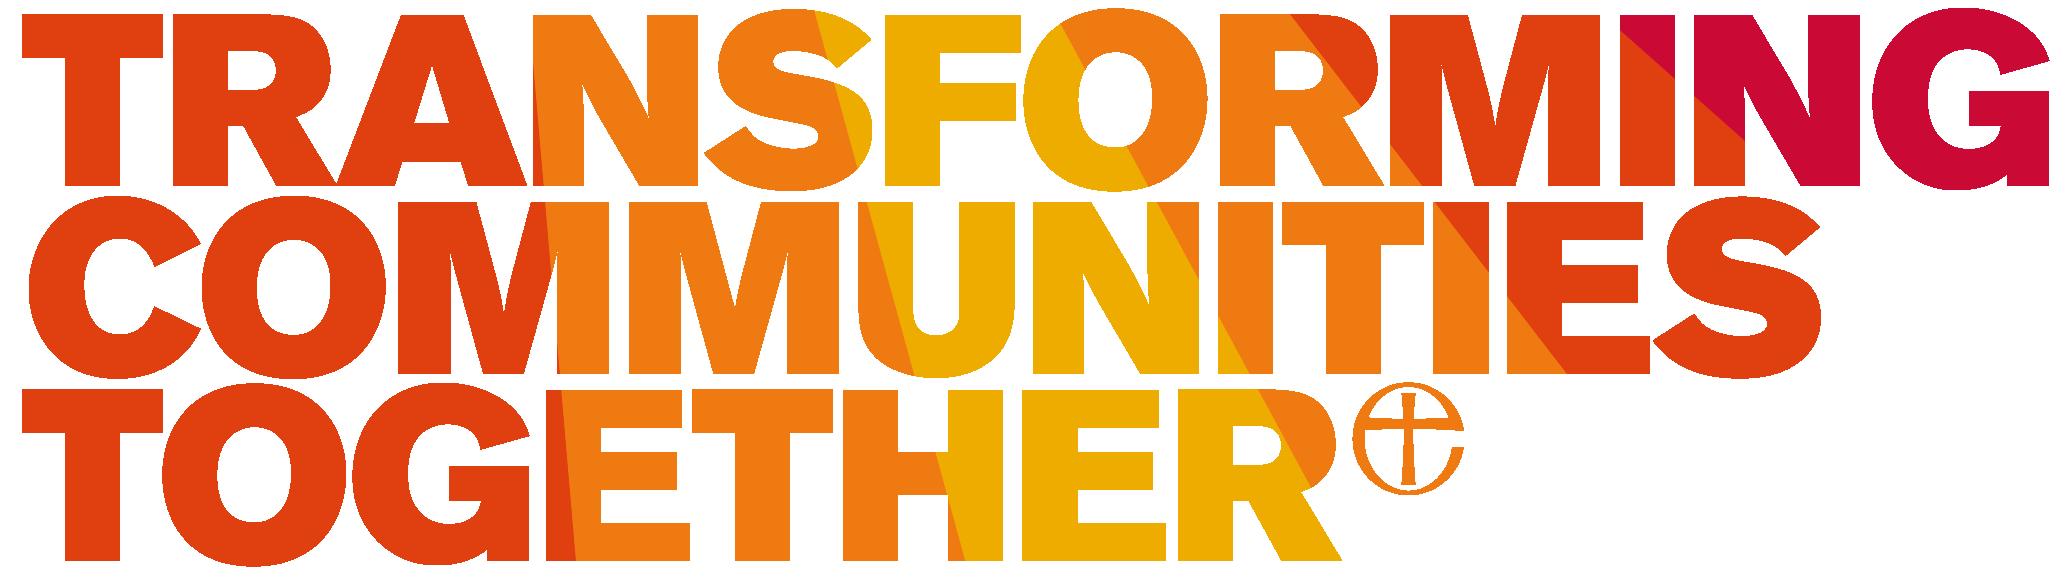 Transforming Communities Together logo